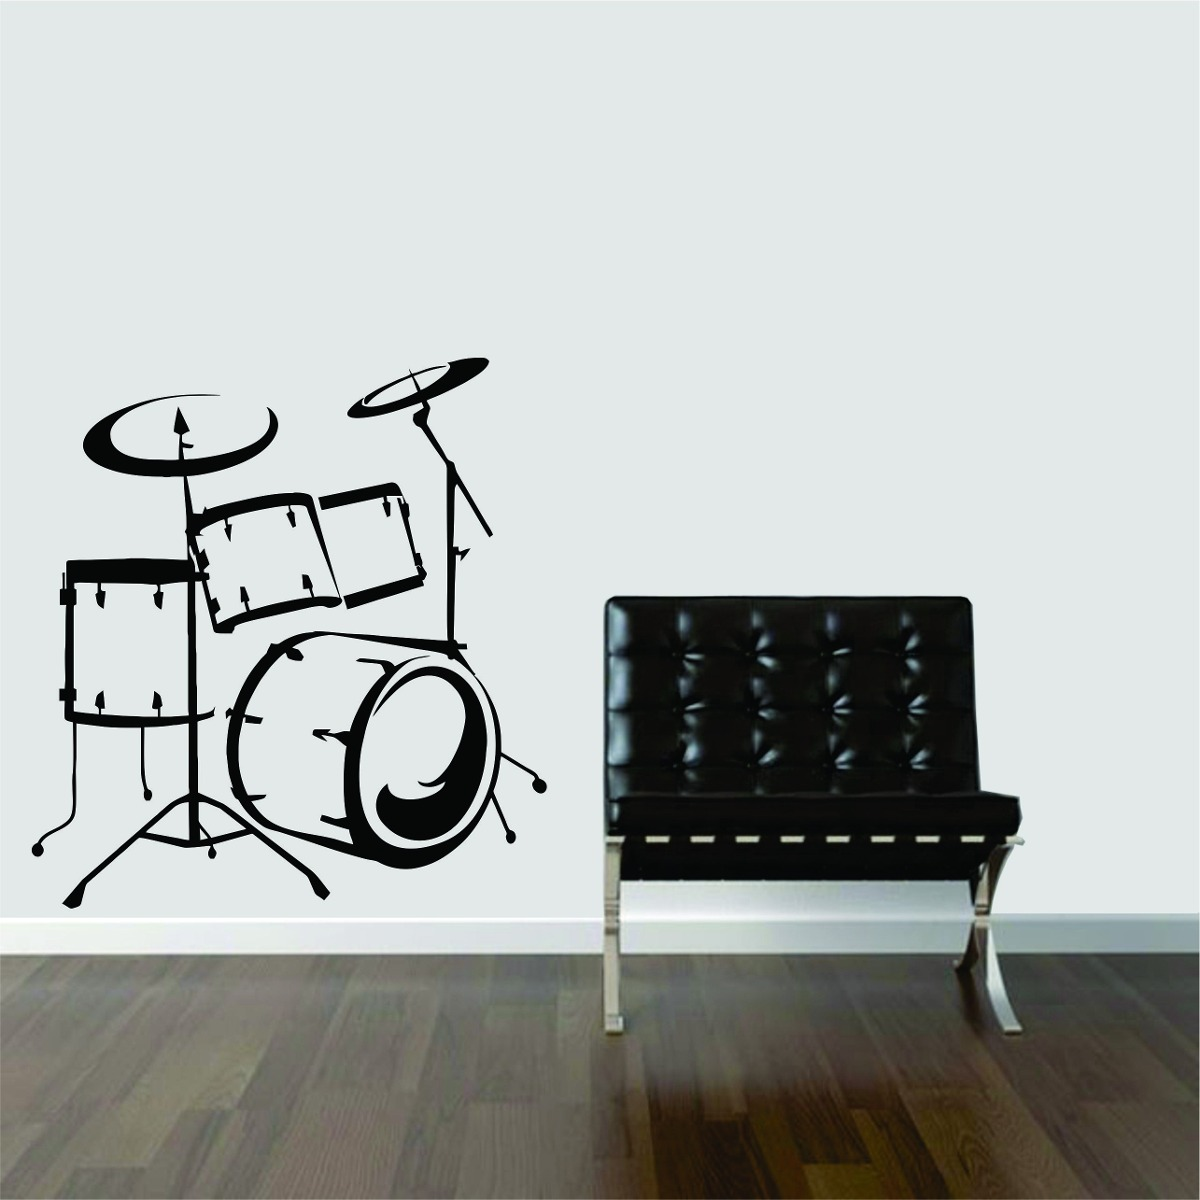 Adesivo Decorativo Parede M Sica Guitarra Bateria Rock R 29 99 Em  -> Papel De Parede Para Sala Rock N Roll